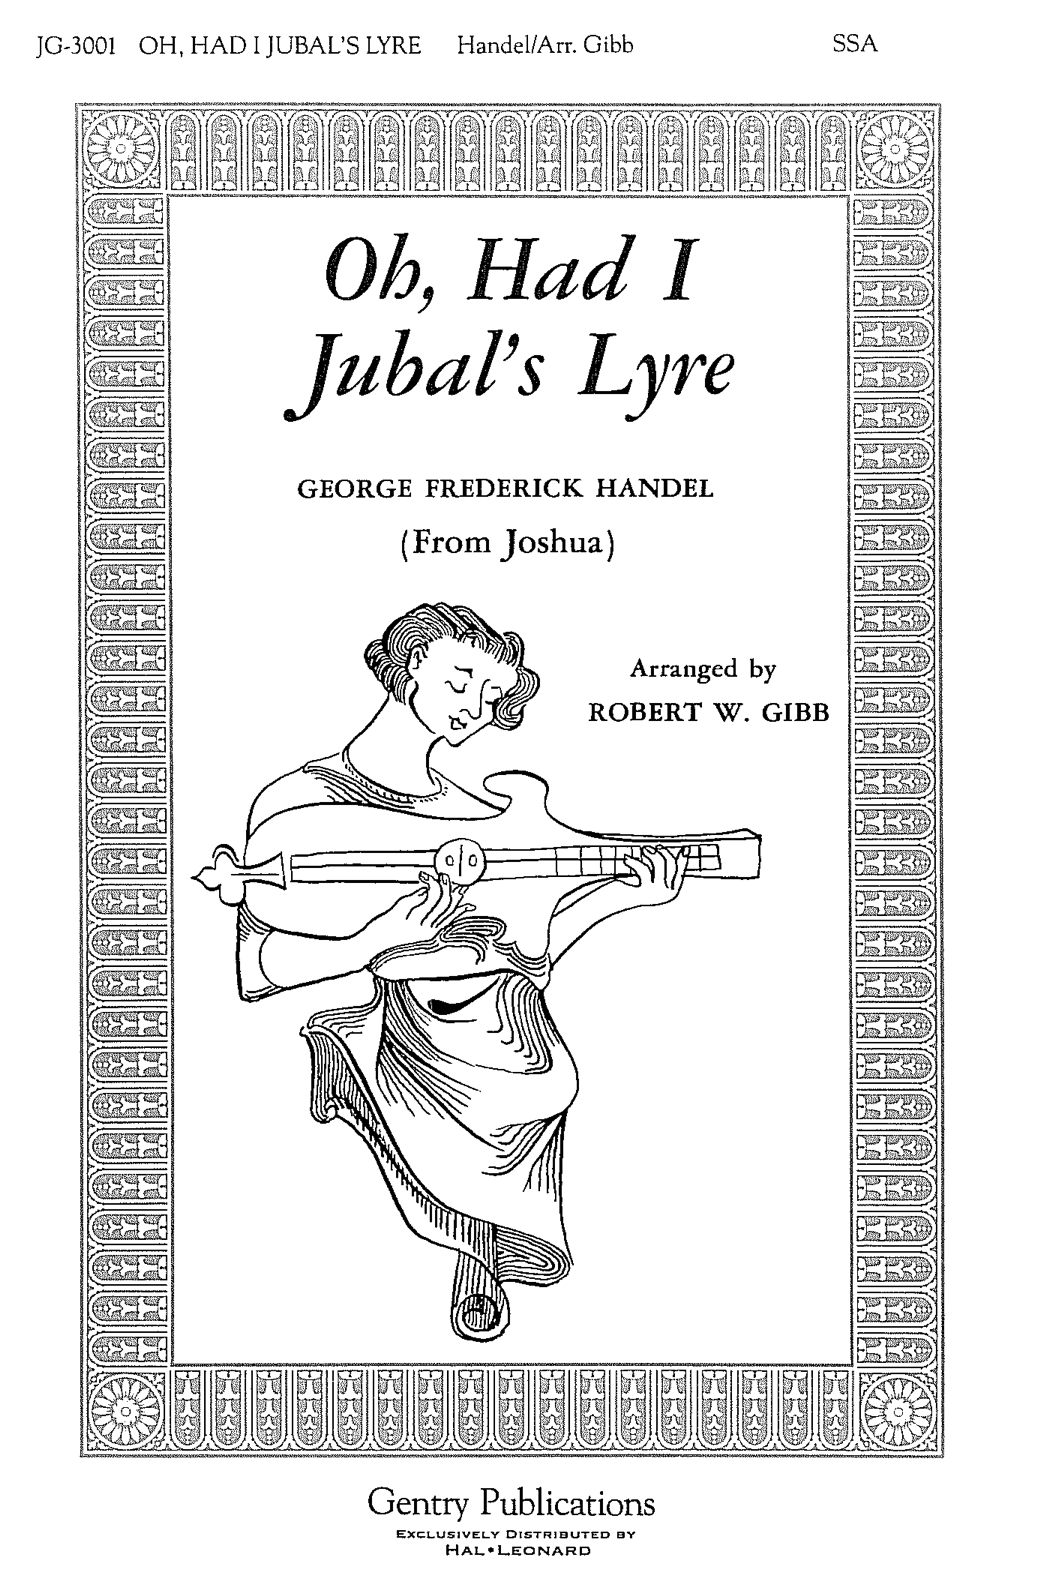 Oh, Had I Jubal's Lyre